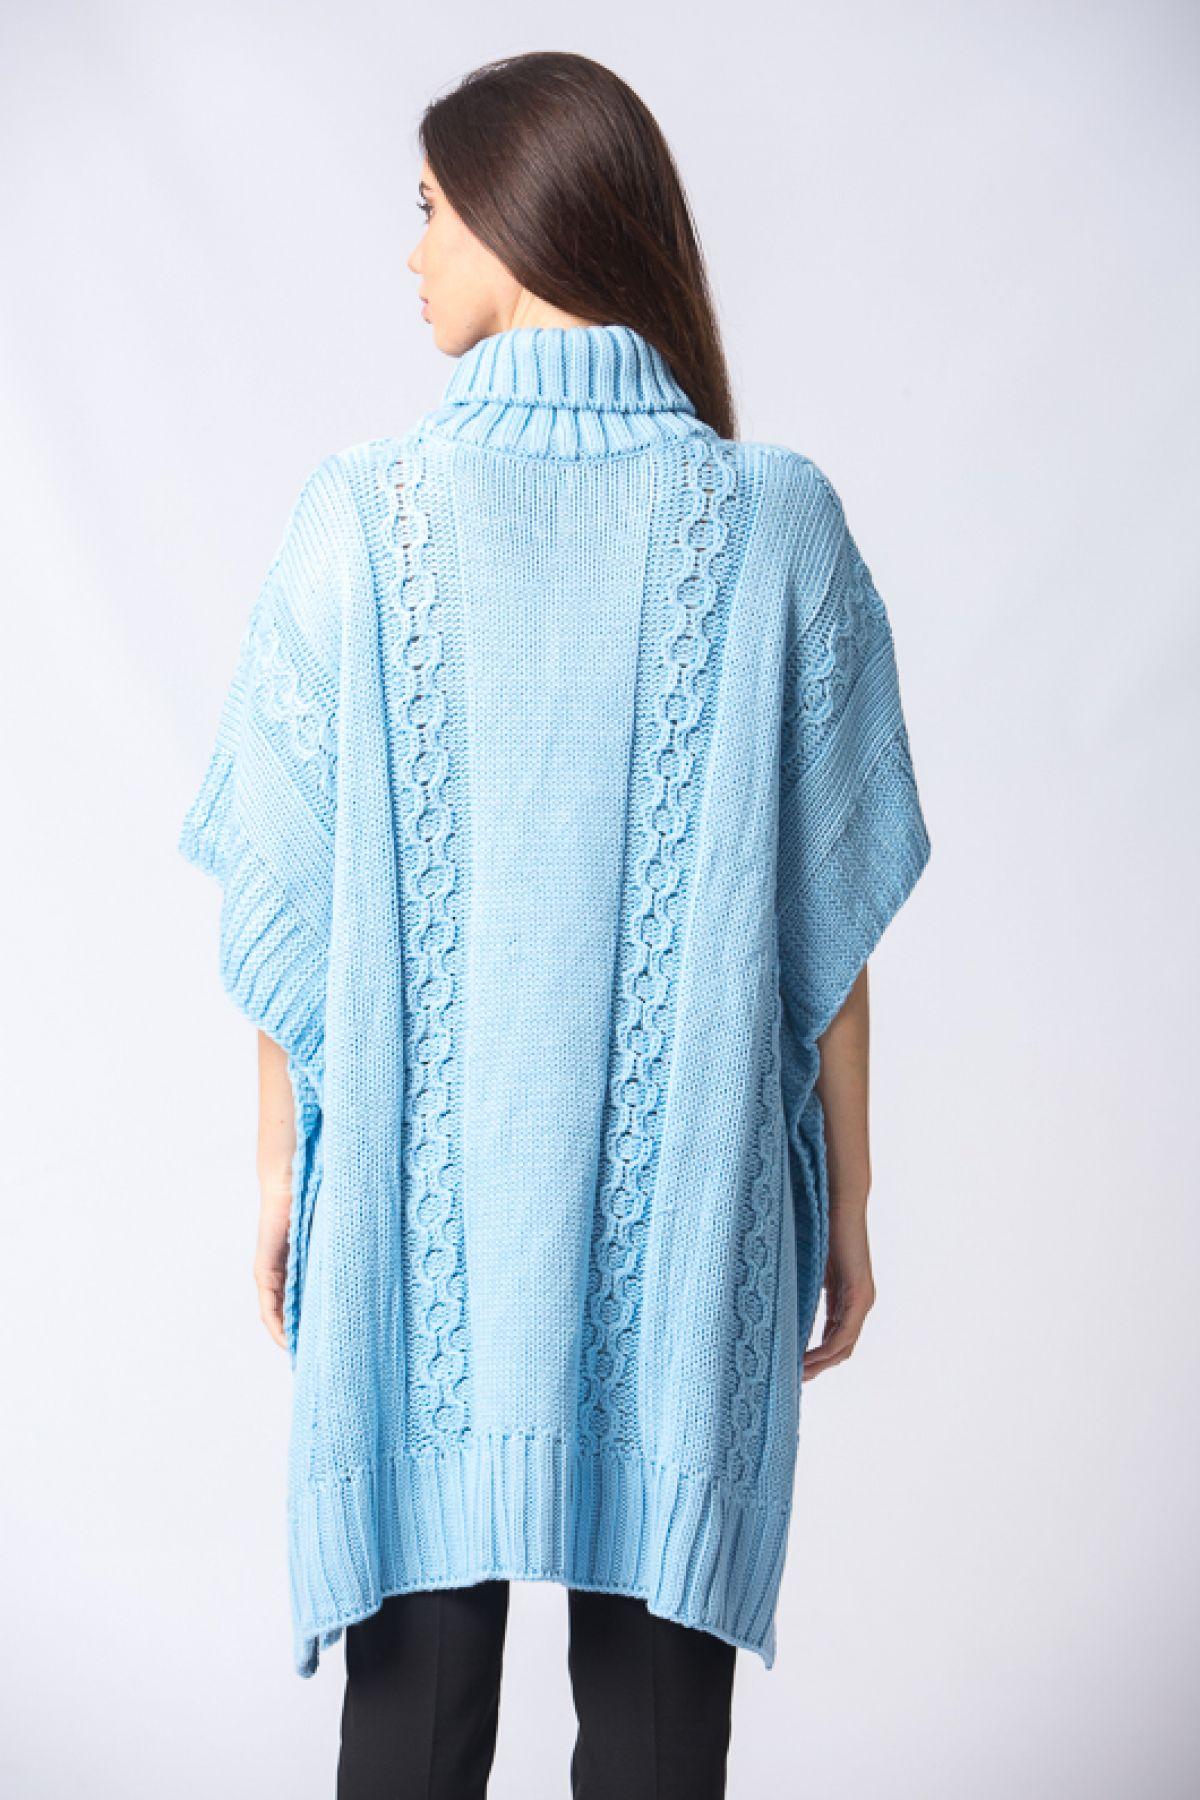 Knitwear-Turquoise